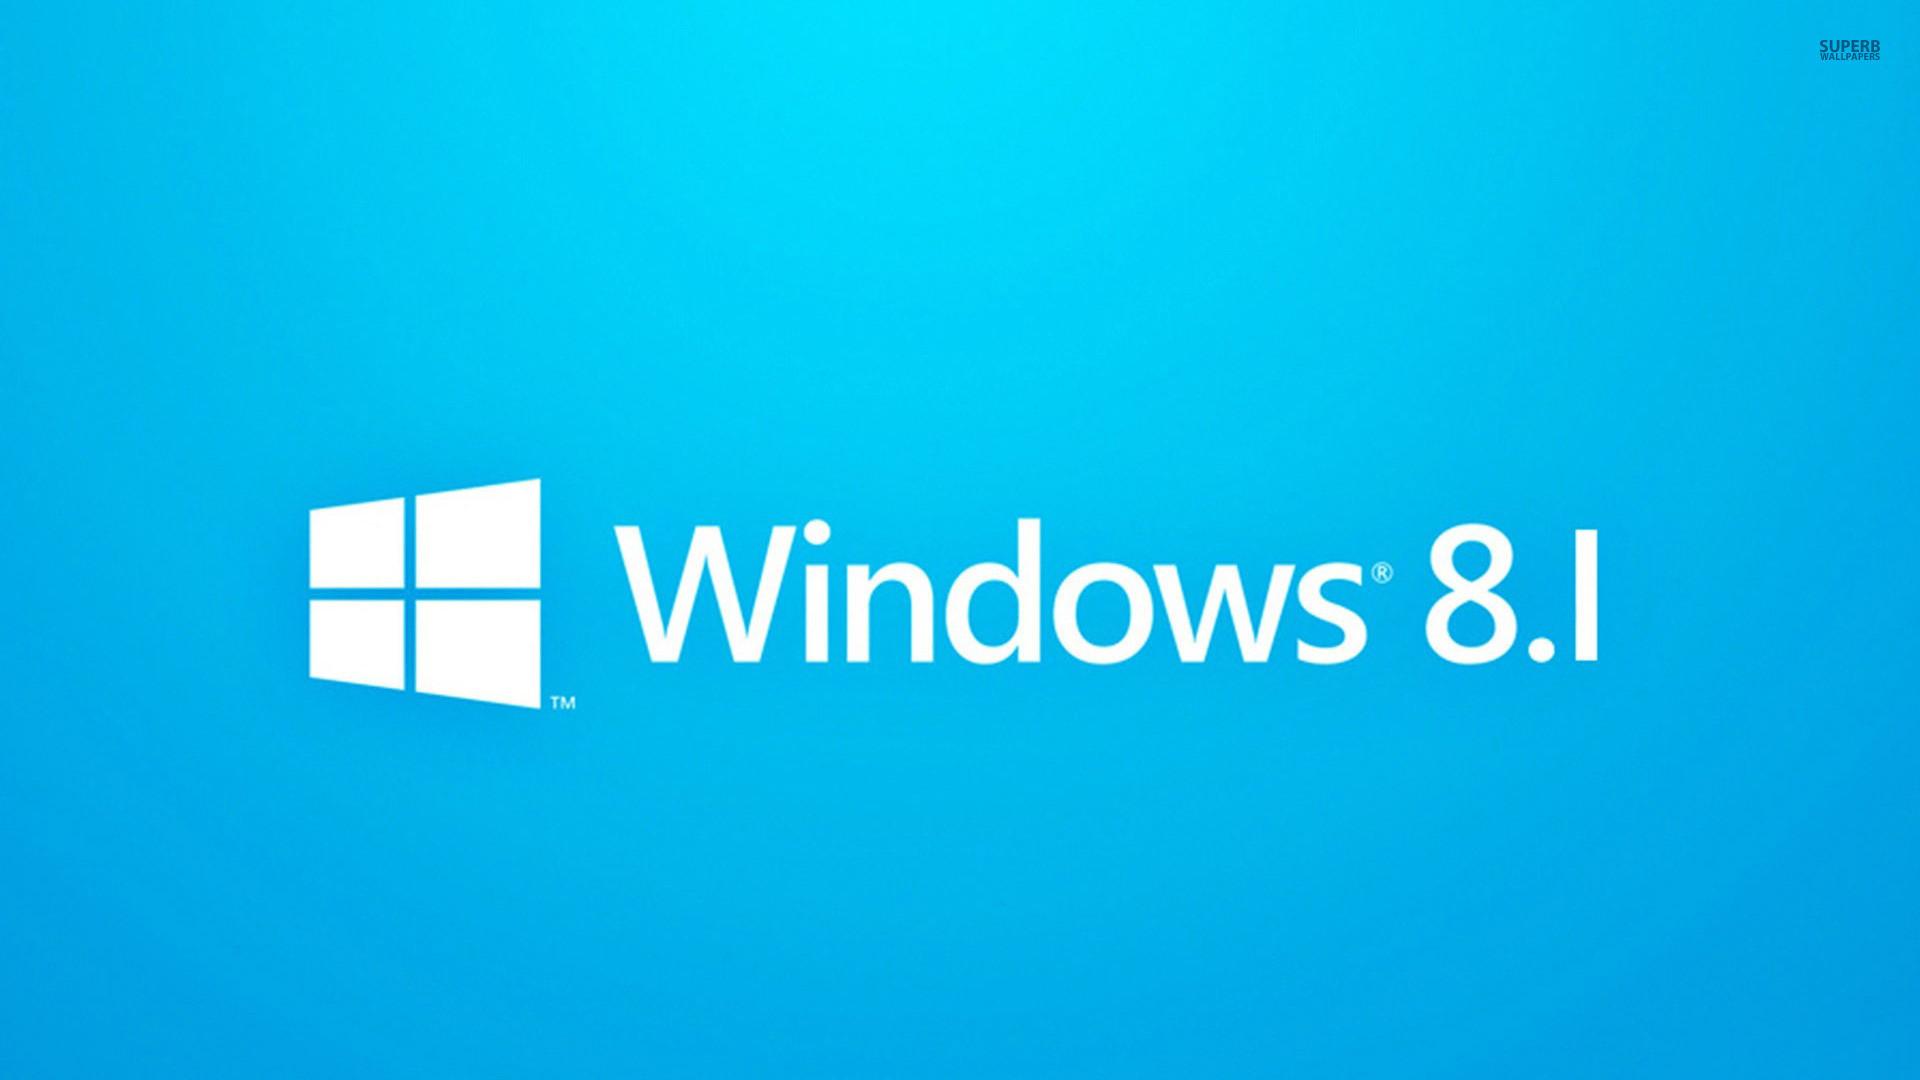 Light Blue Windows 8.1 HD Wallpaper – MixHD wallpapers